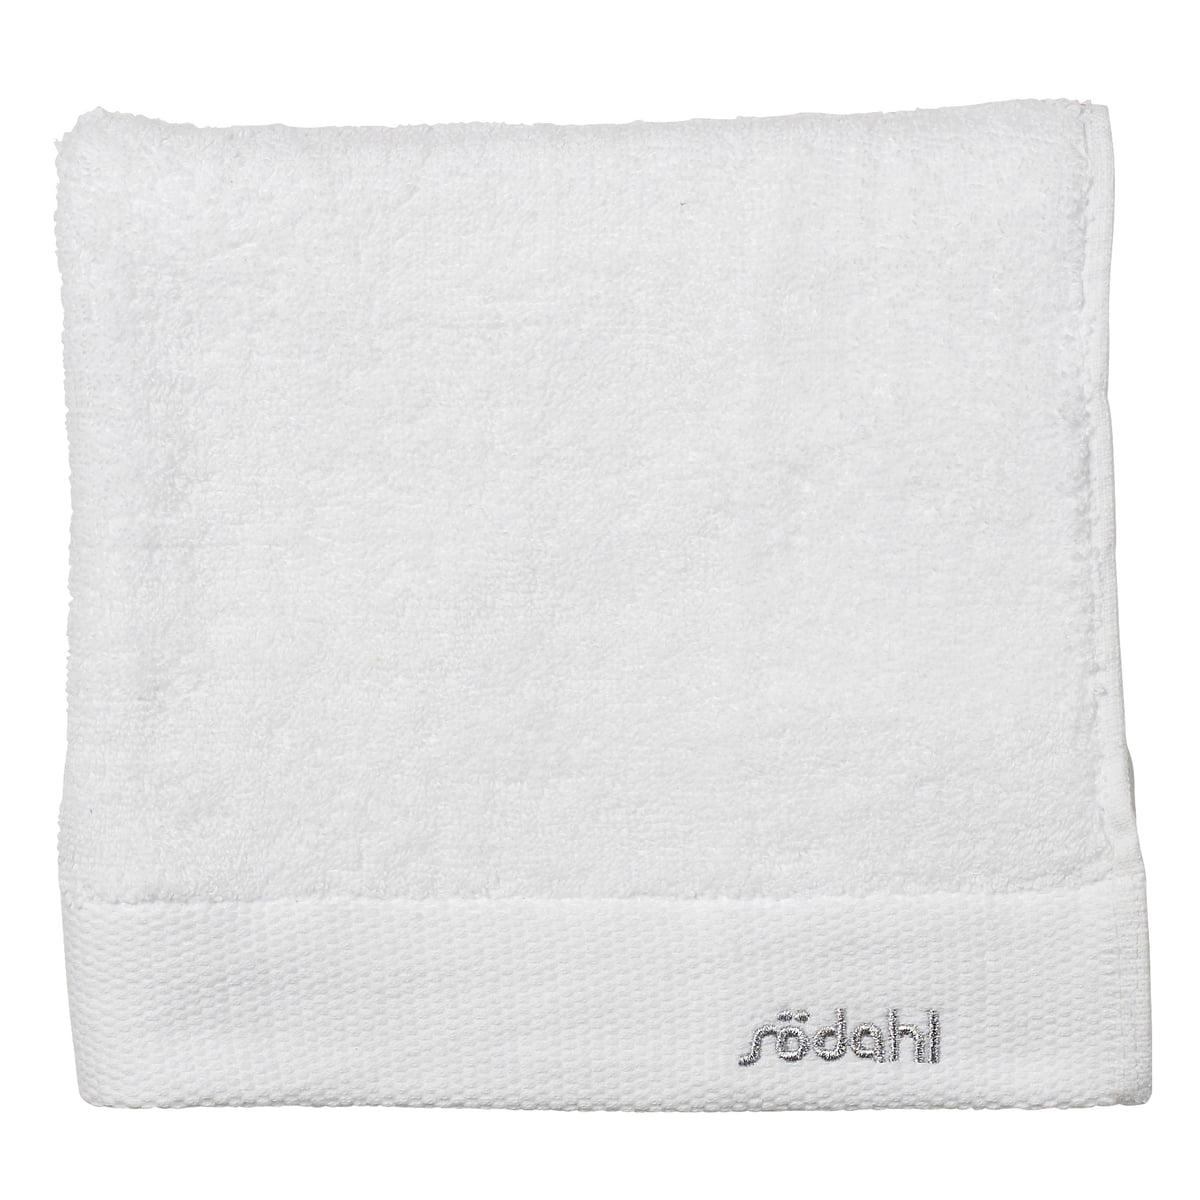 Södahl - Comfort Badetuch 70 x 140 cm, weiß | Bad > Handtücher | Weiß | Södahl